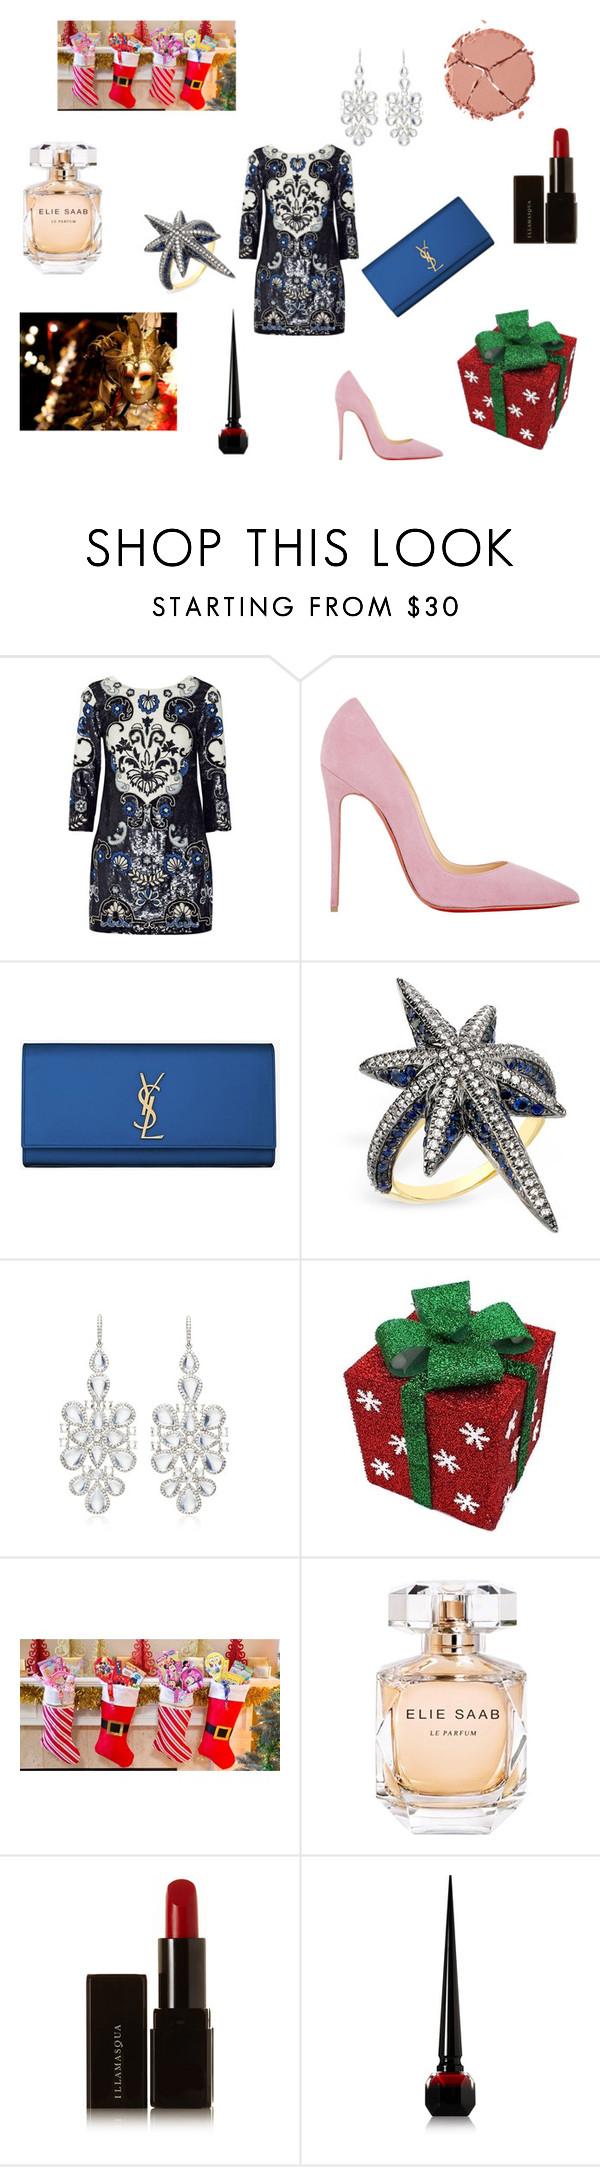 """Kinda Christmas party look"" by maria-chamourlidou ❤ liked on Polyvore featuring Needle & Thread, Christian Louboutin, Yves Saint Laurent, Venyx, NSR Nina Runsdorf, Elie Saab, Illamasqua and Charlotte Tilbury"